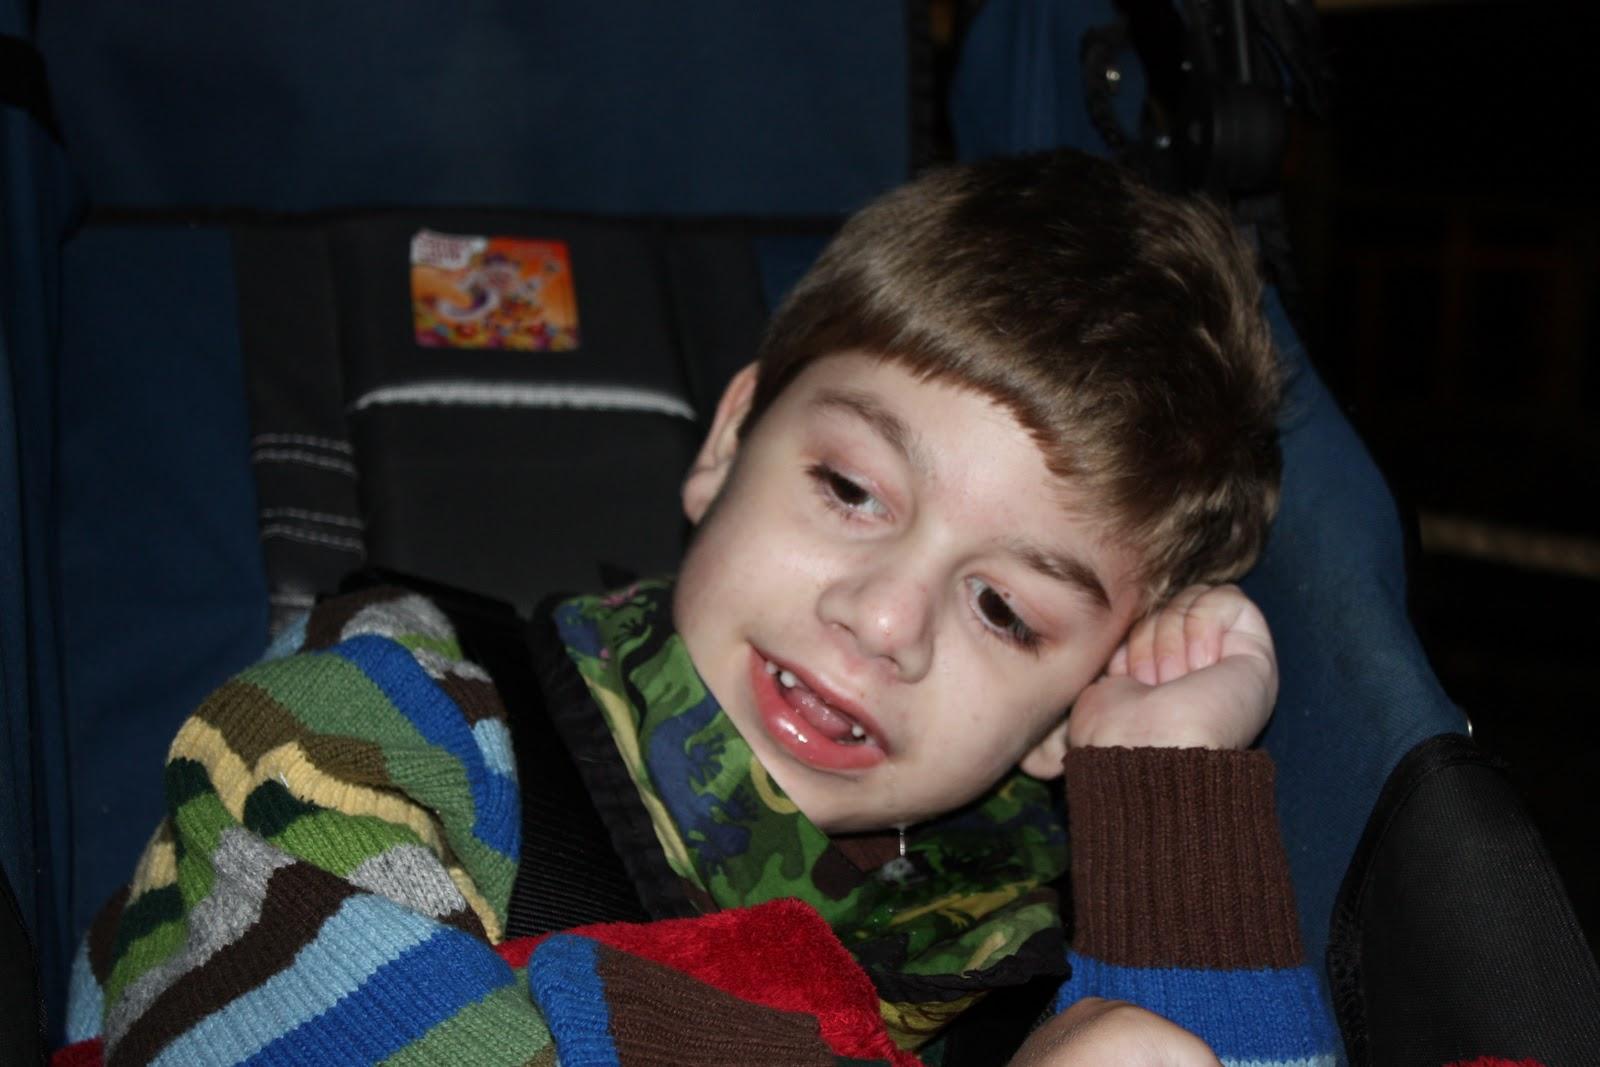 Jake is our sweet 7-year-old boy who is suffering from a neurodegenerative  disease called late infantile Neuronal Ceroid Lipofuscinosis, or Batten  Disease.